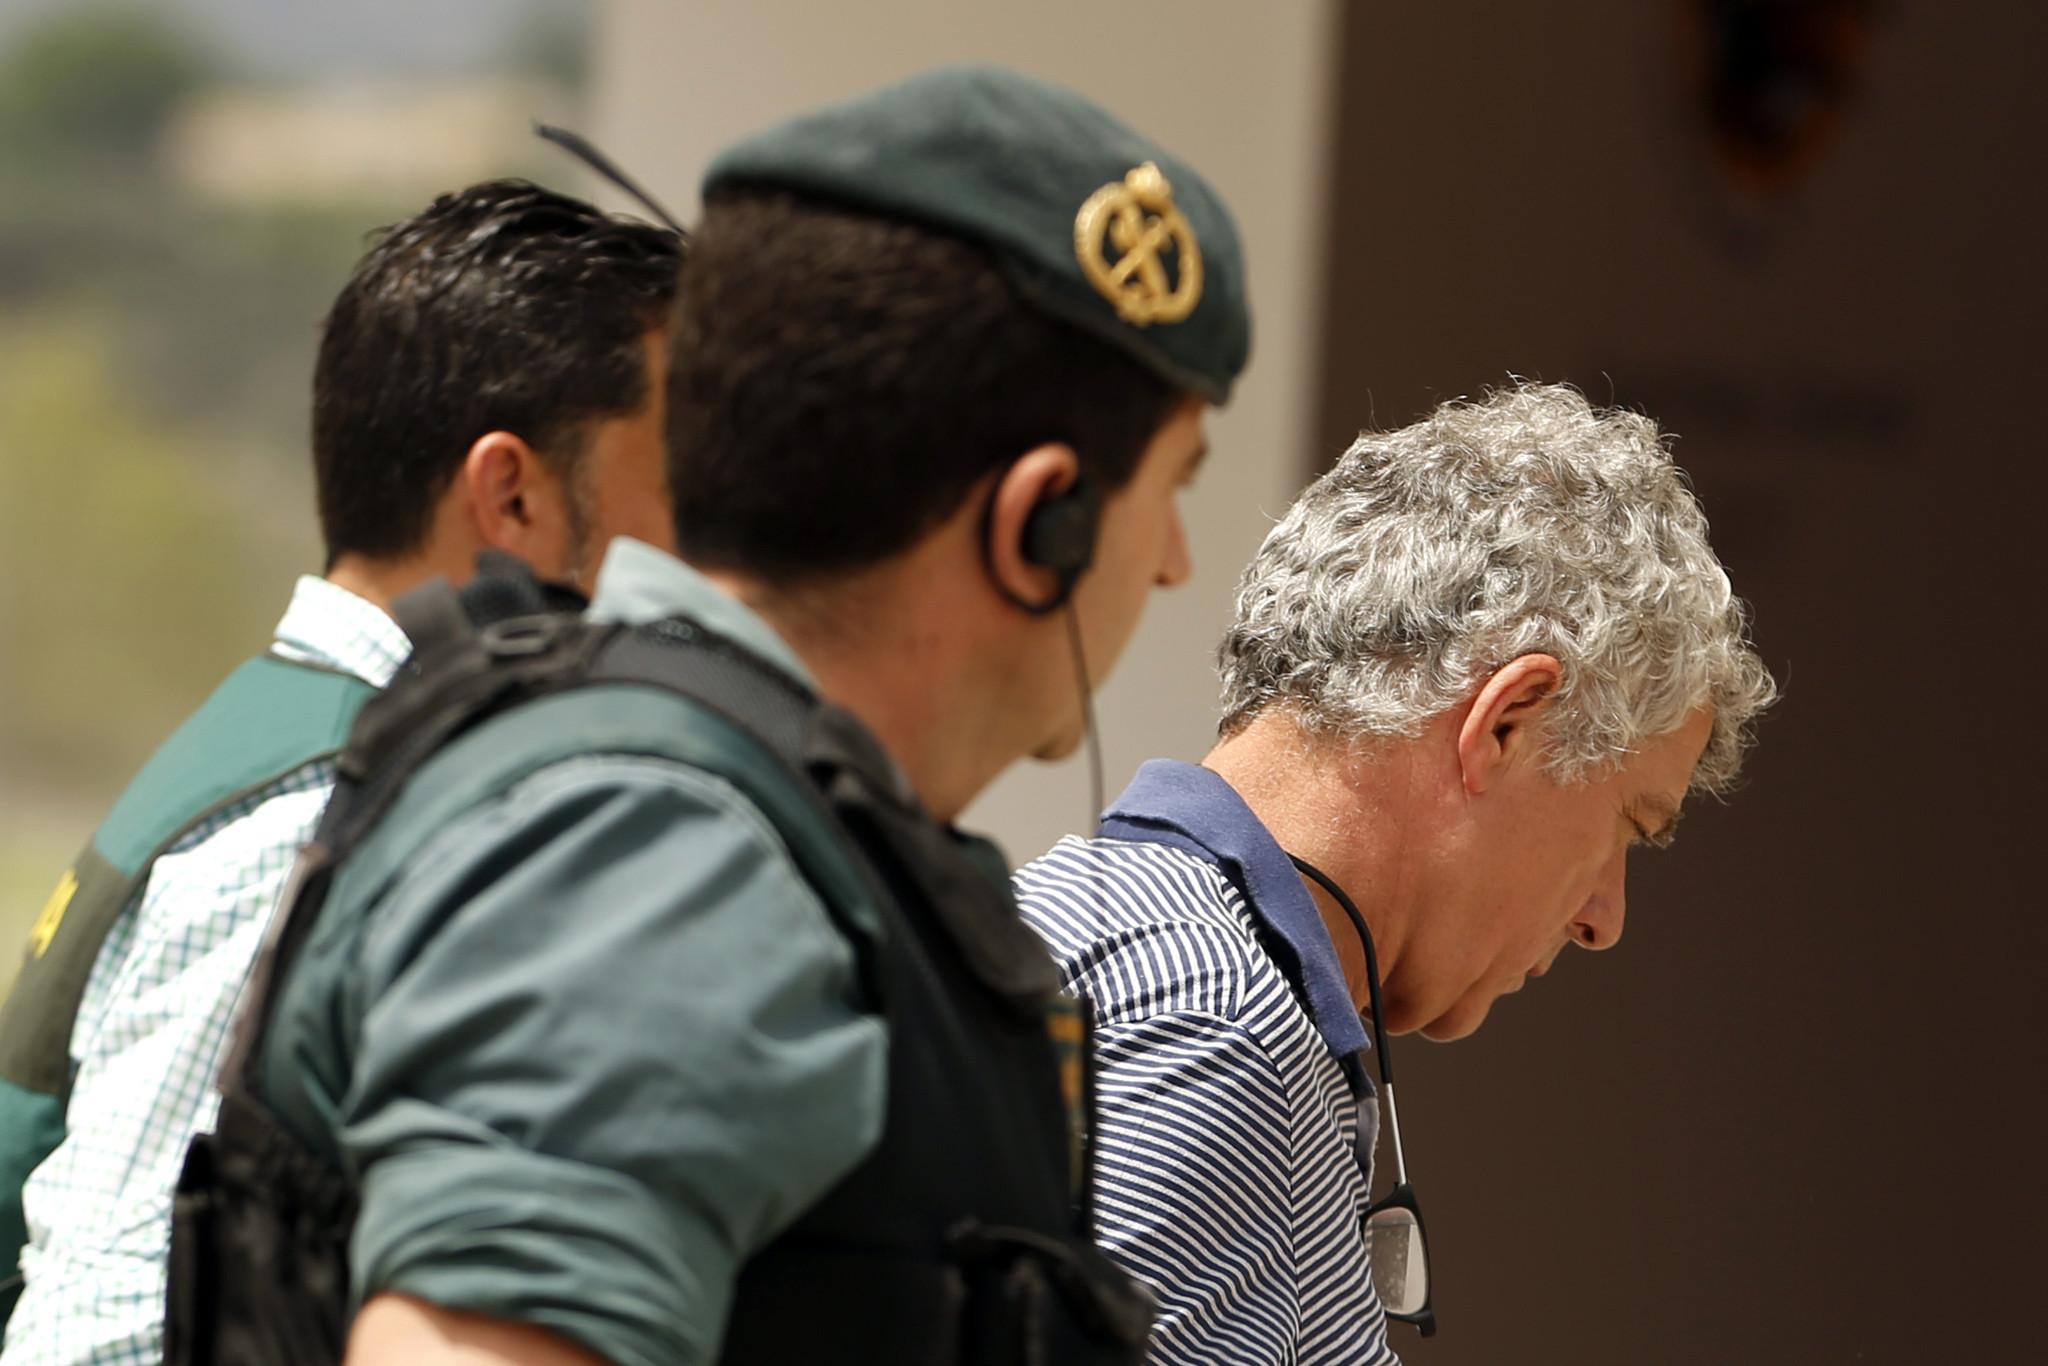 Ct-hoy-spanish-federation-boss-villar-suspended-after-arrest-20170725